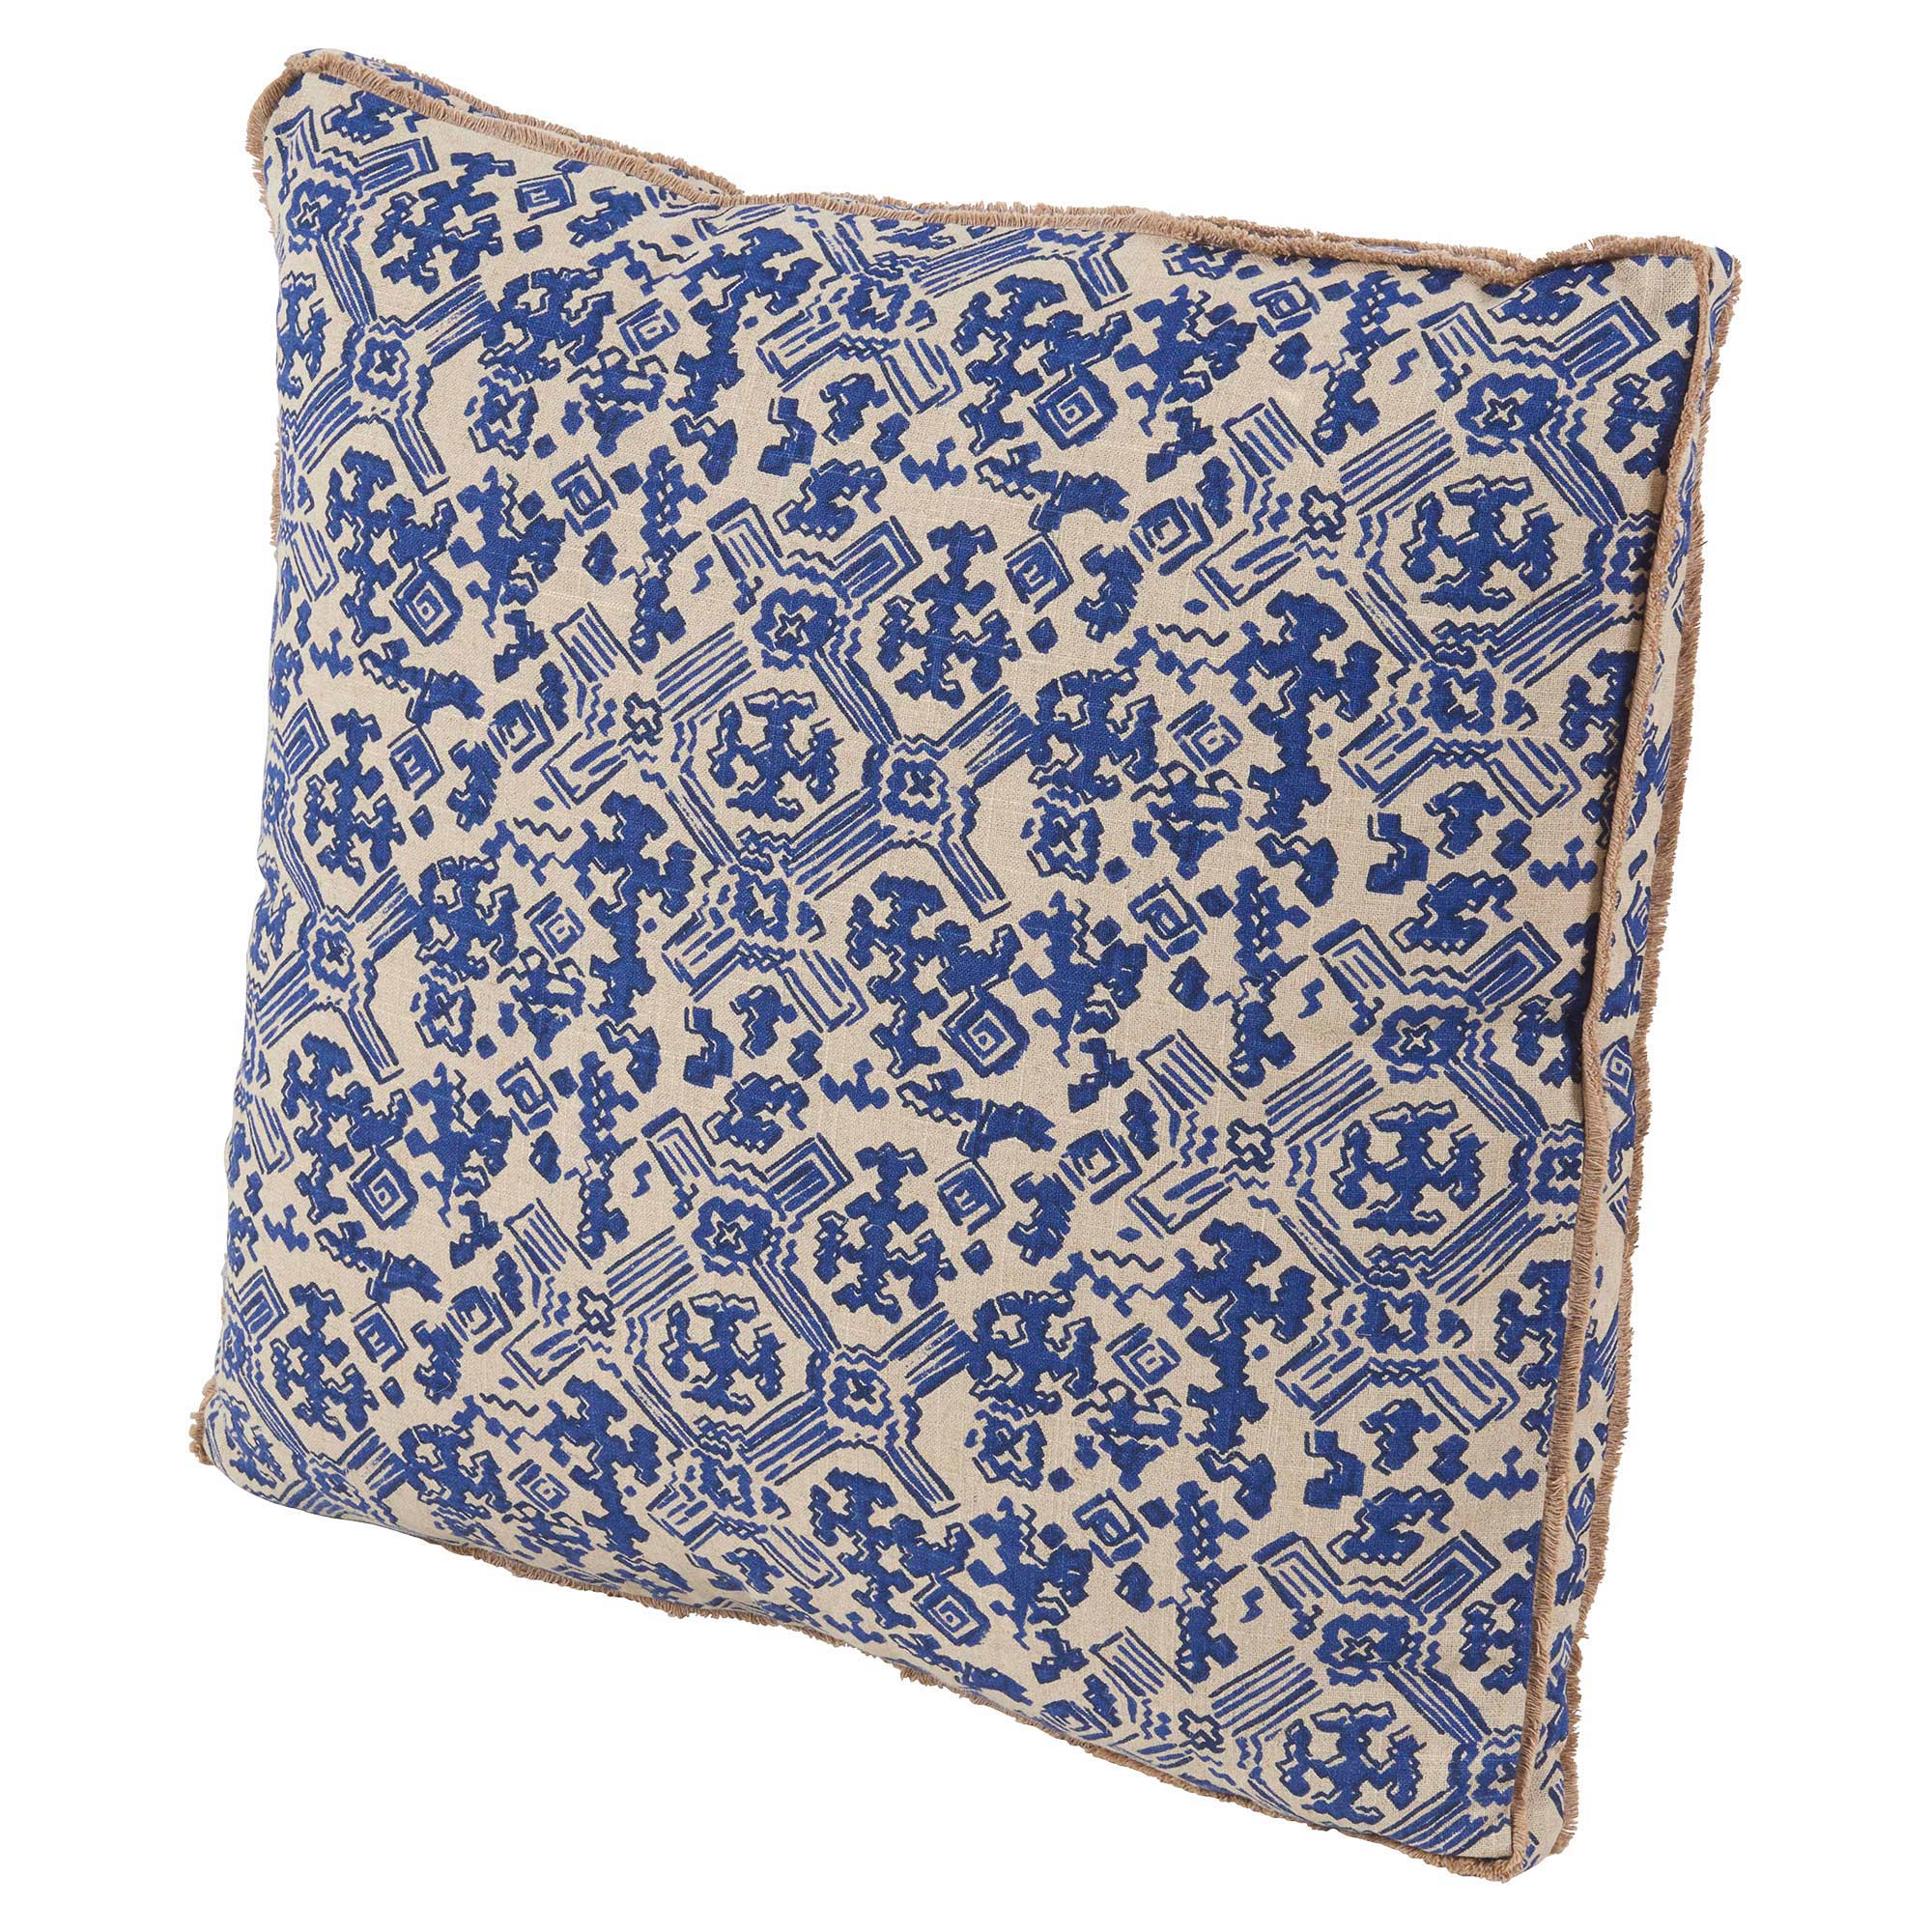 Noma Bazaar Blue Beige Tribal Print Eyelash Pillow - 22x22